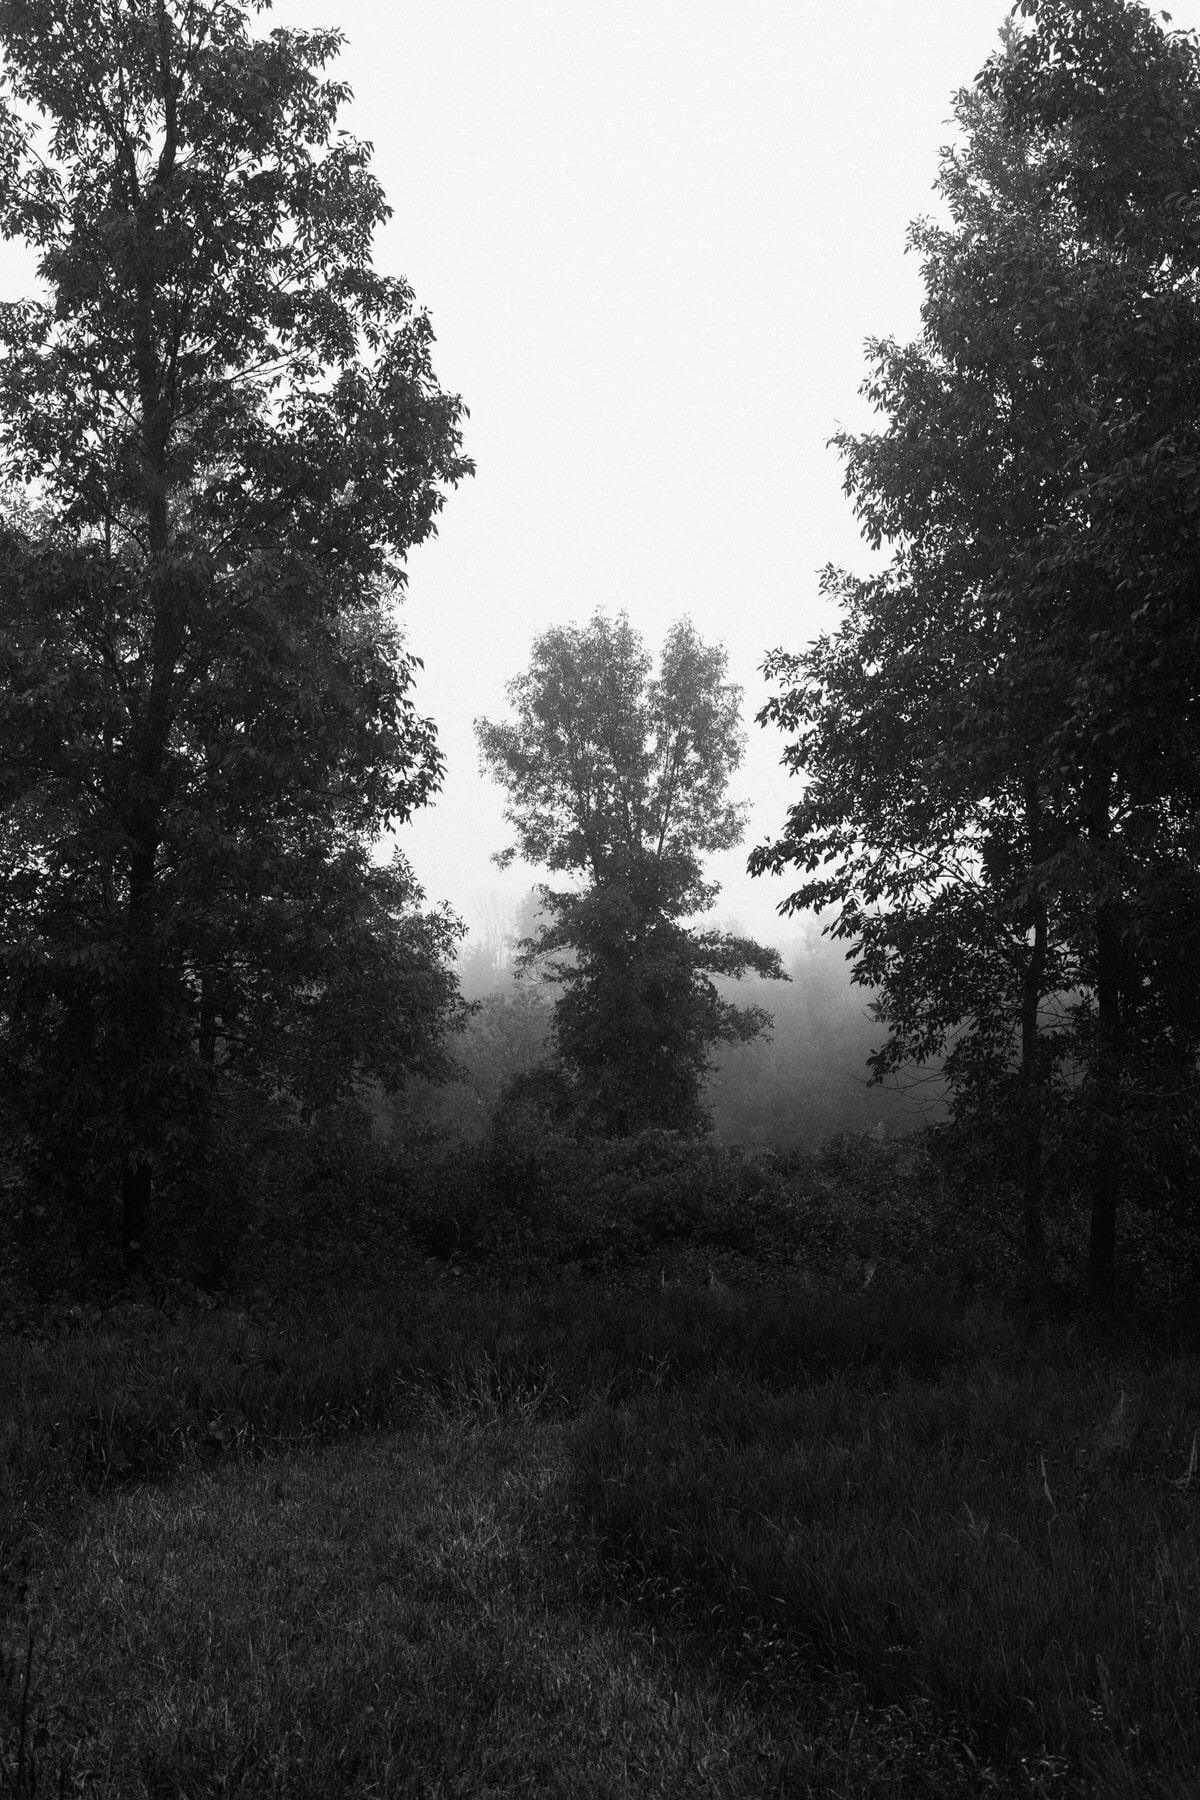 Kiekhaefer-Park-Fond-du-Lac-Wisconsin-black-and-white-fine-art-photography-by-Studio-L-photographer-Laura-Schneider-_3491